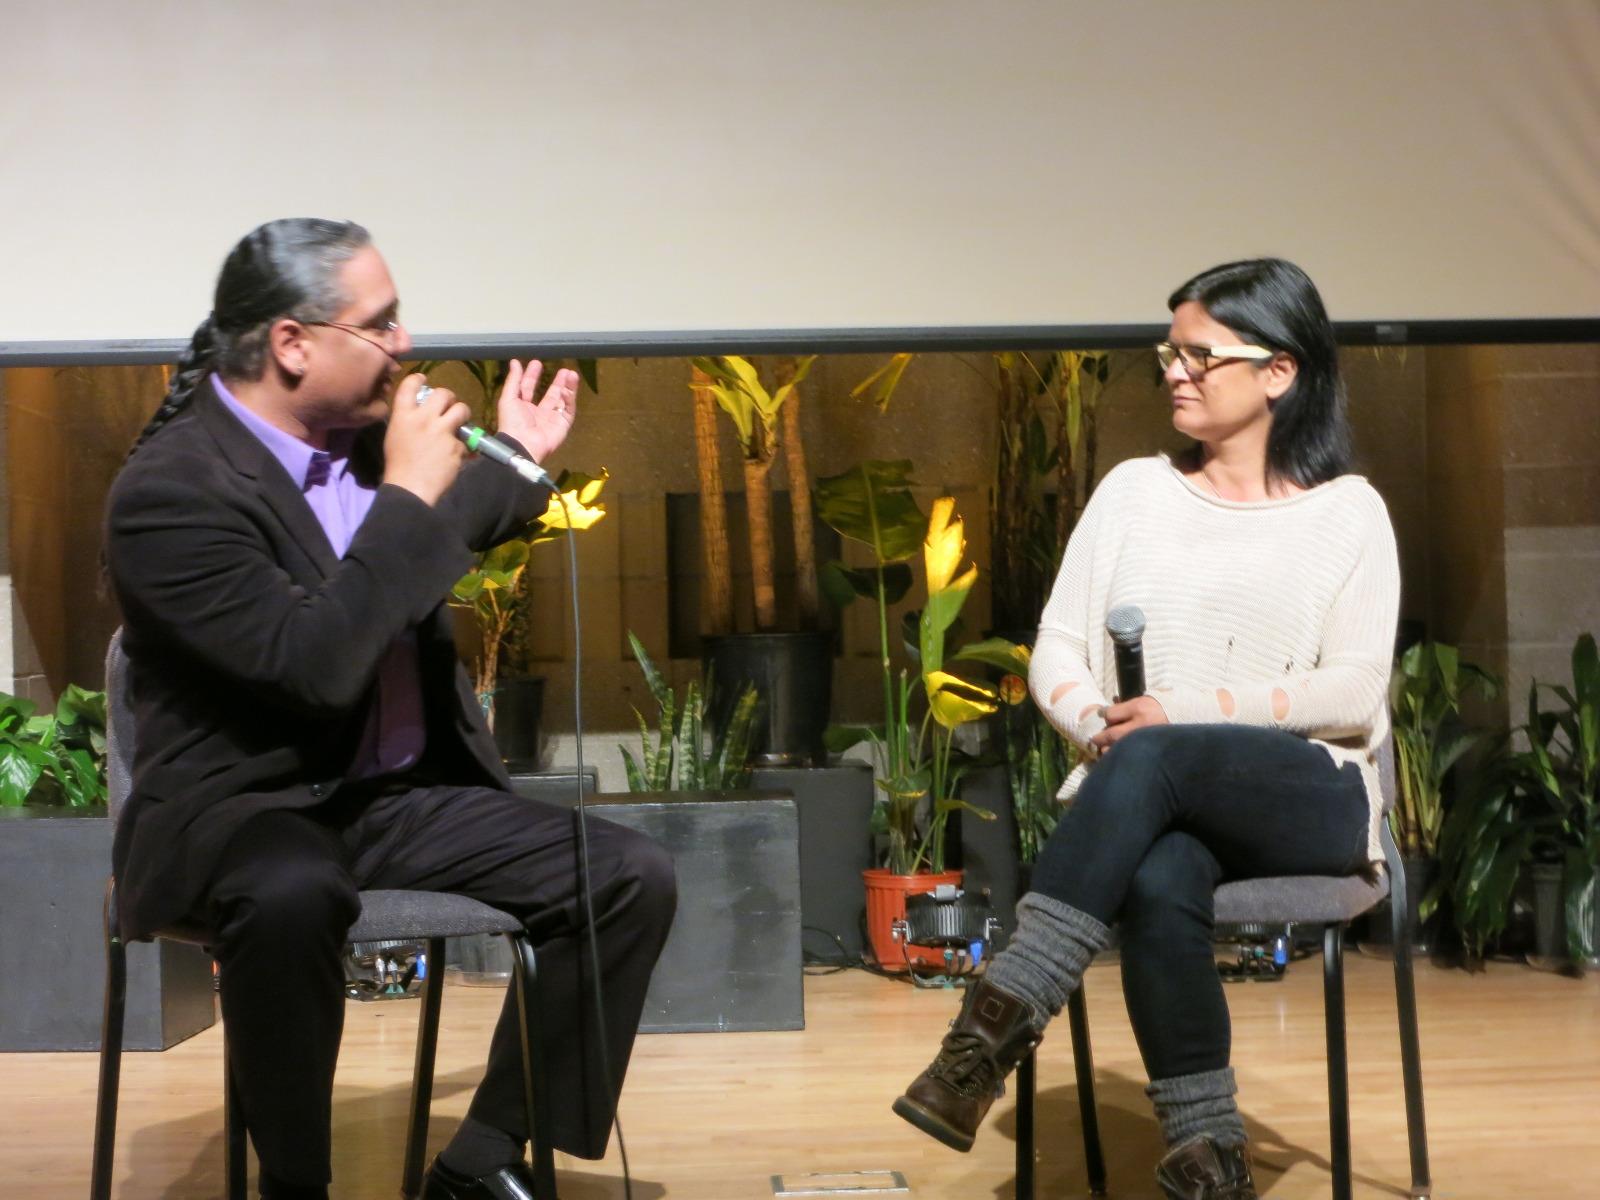 Roberto Borrero interviews Georgina Lighting after the screening of her film,  OLDER THAN AMERICA.